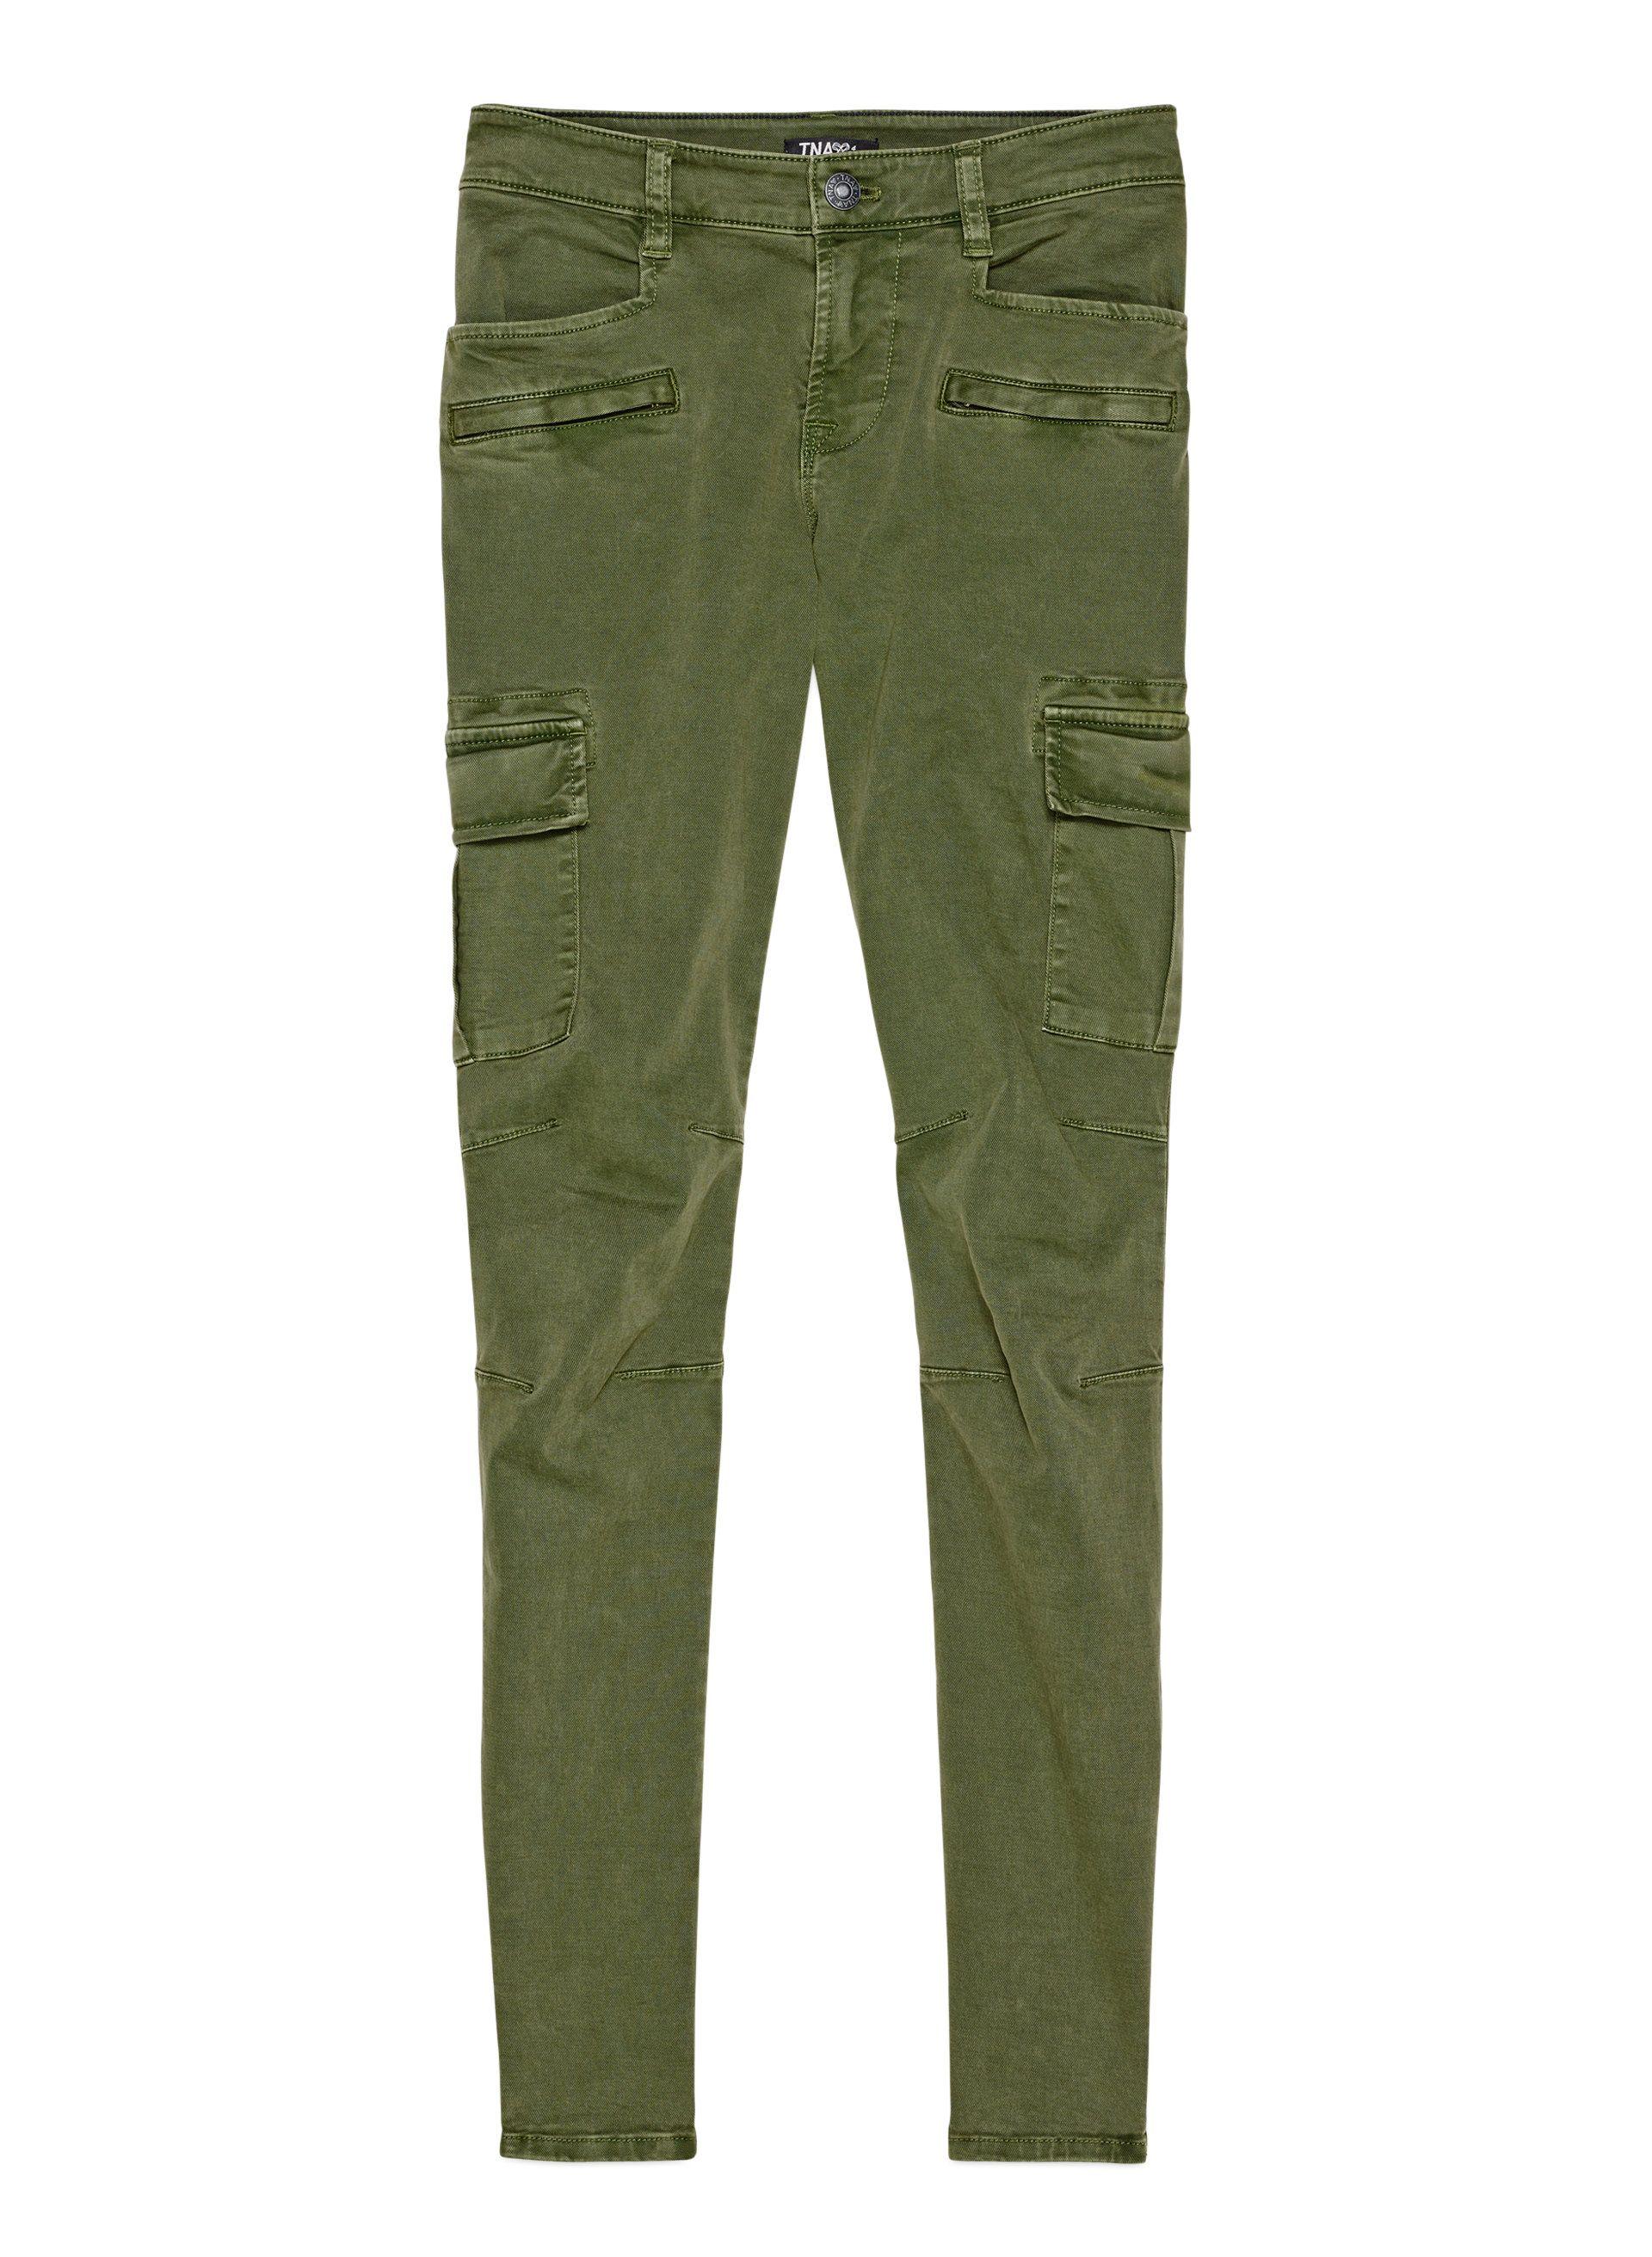 a6b3cf7a2af TNA STEEN PANT | Aritzia School Fashion, Warm Weather, Khaki Pants, Back To